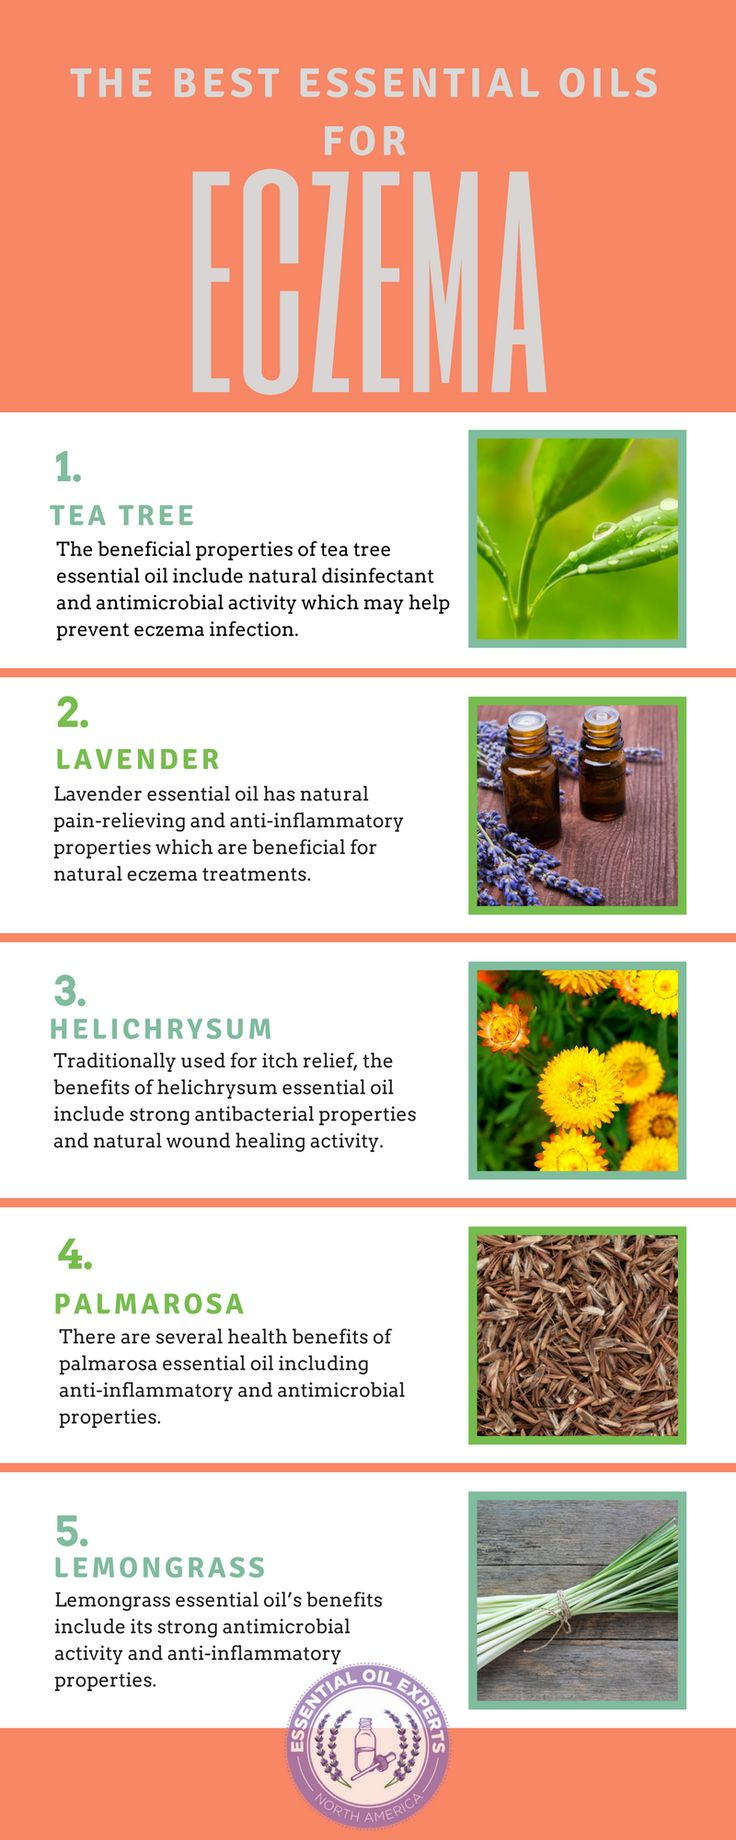 Best Essential Oils for Eczema - Treating Eczema Naturally